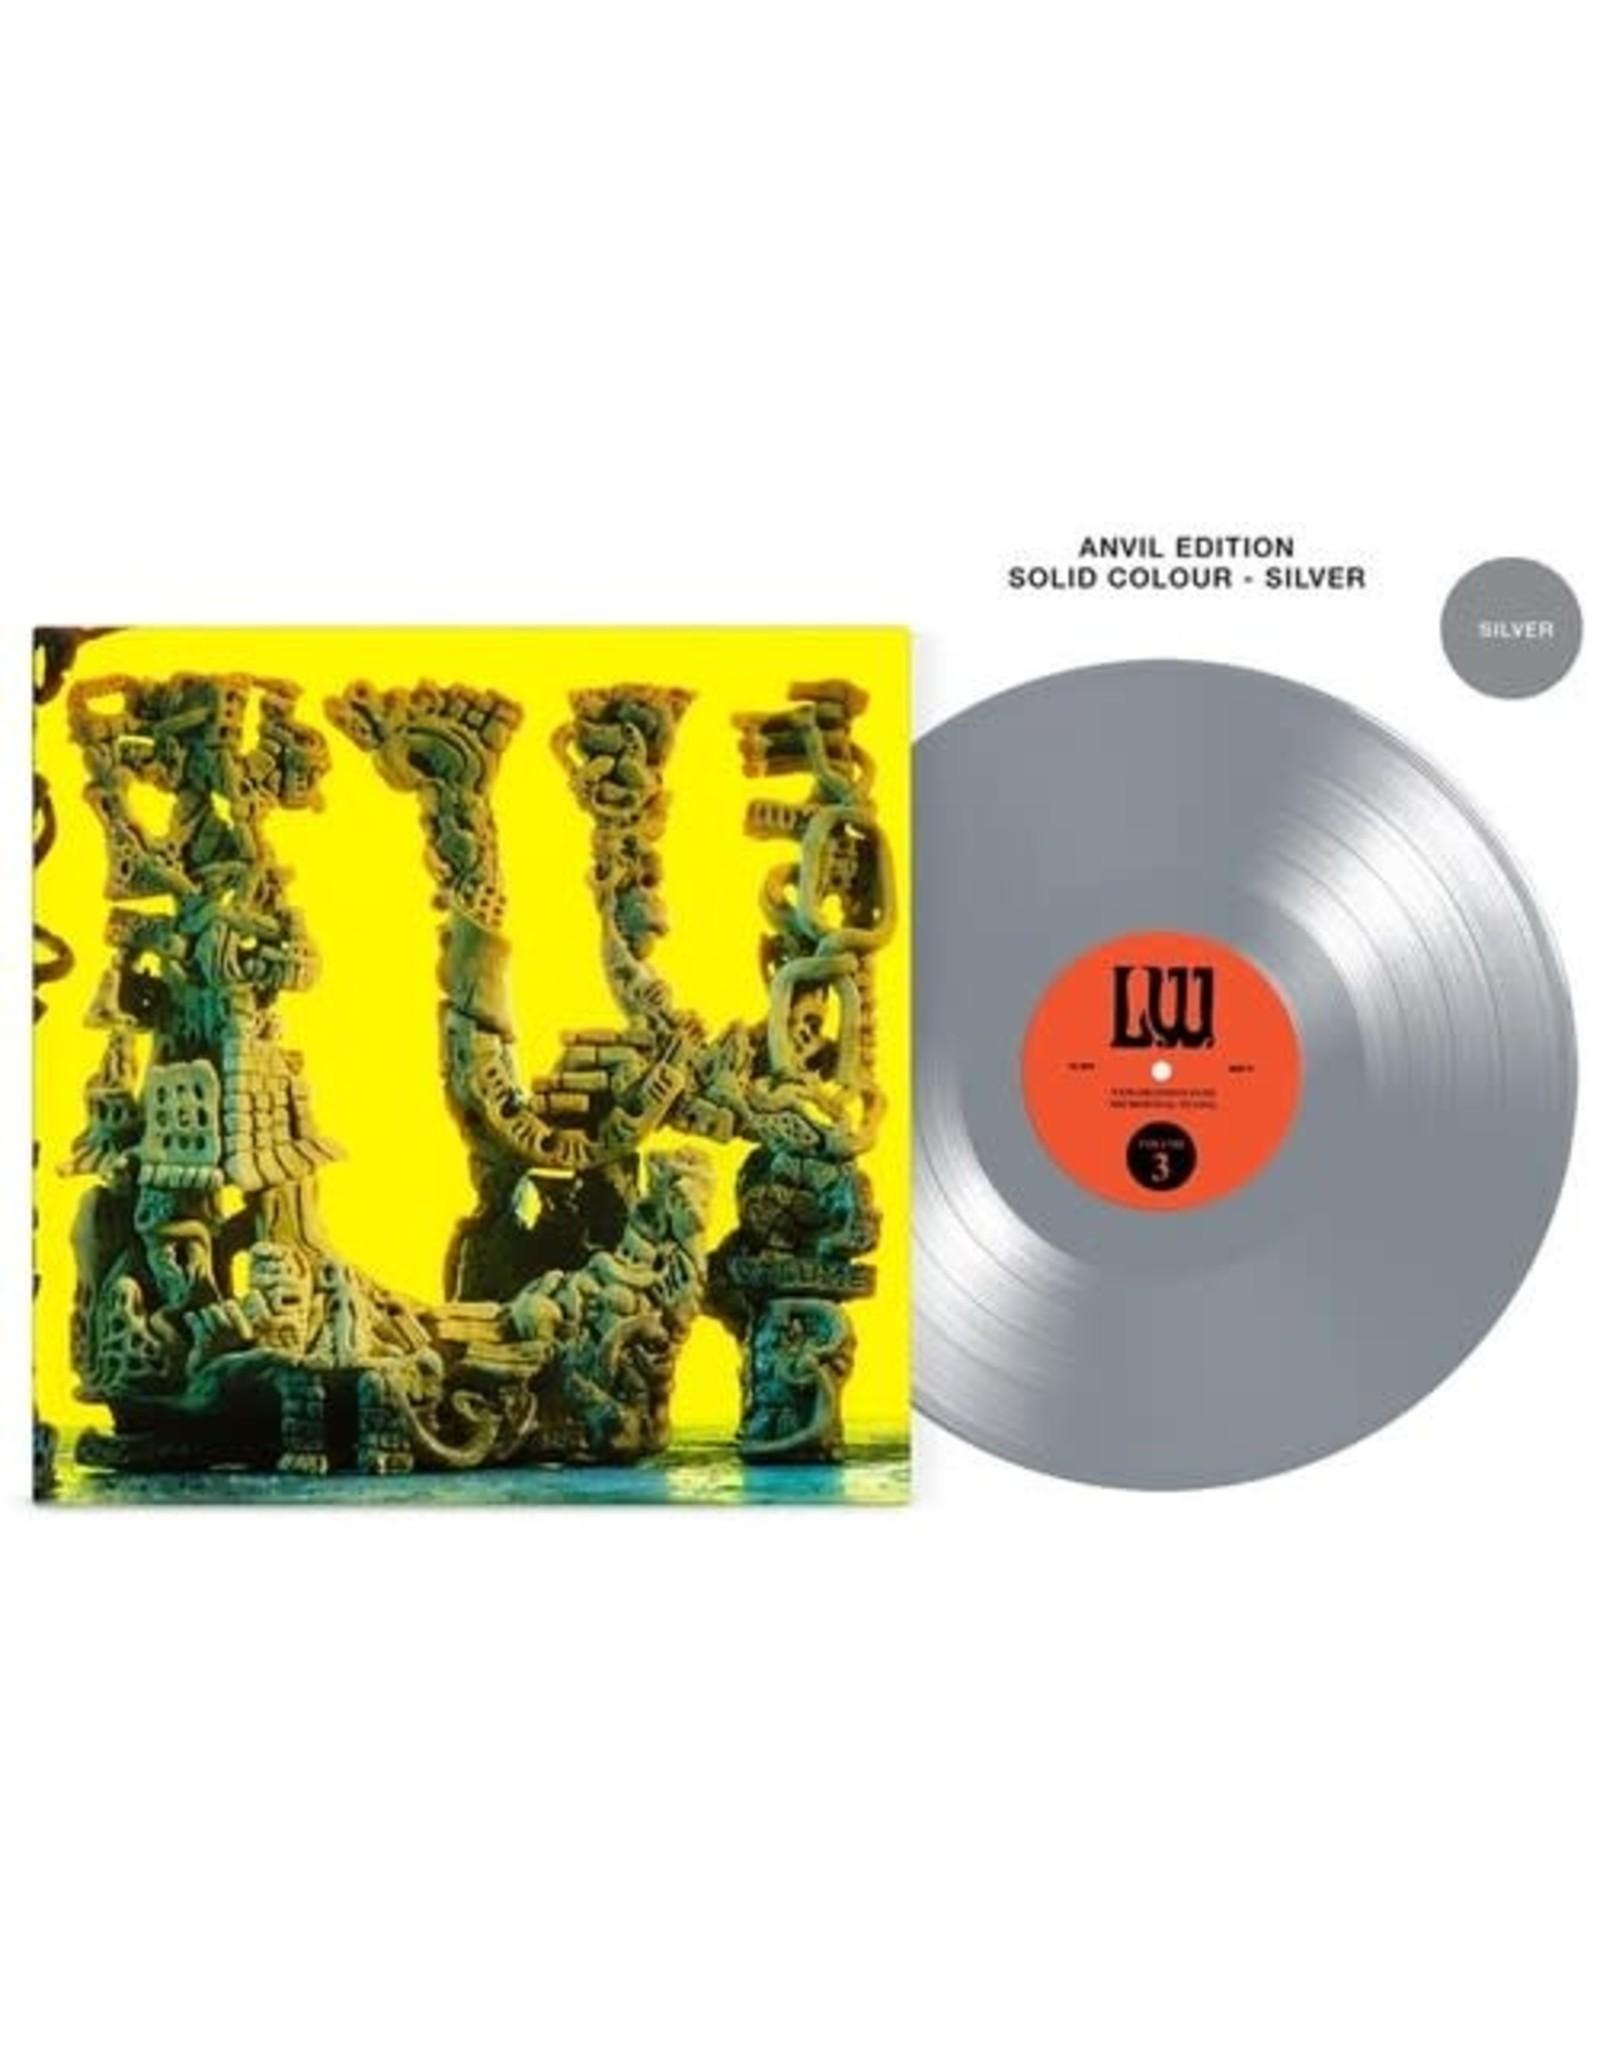 New Vinyl Madvillain